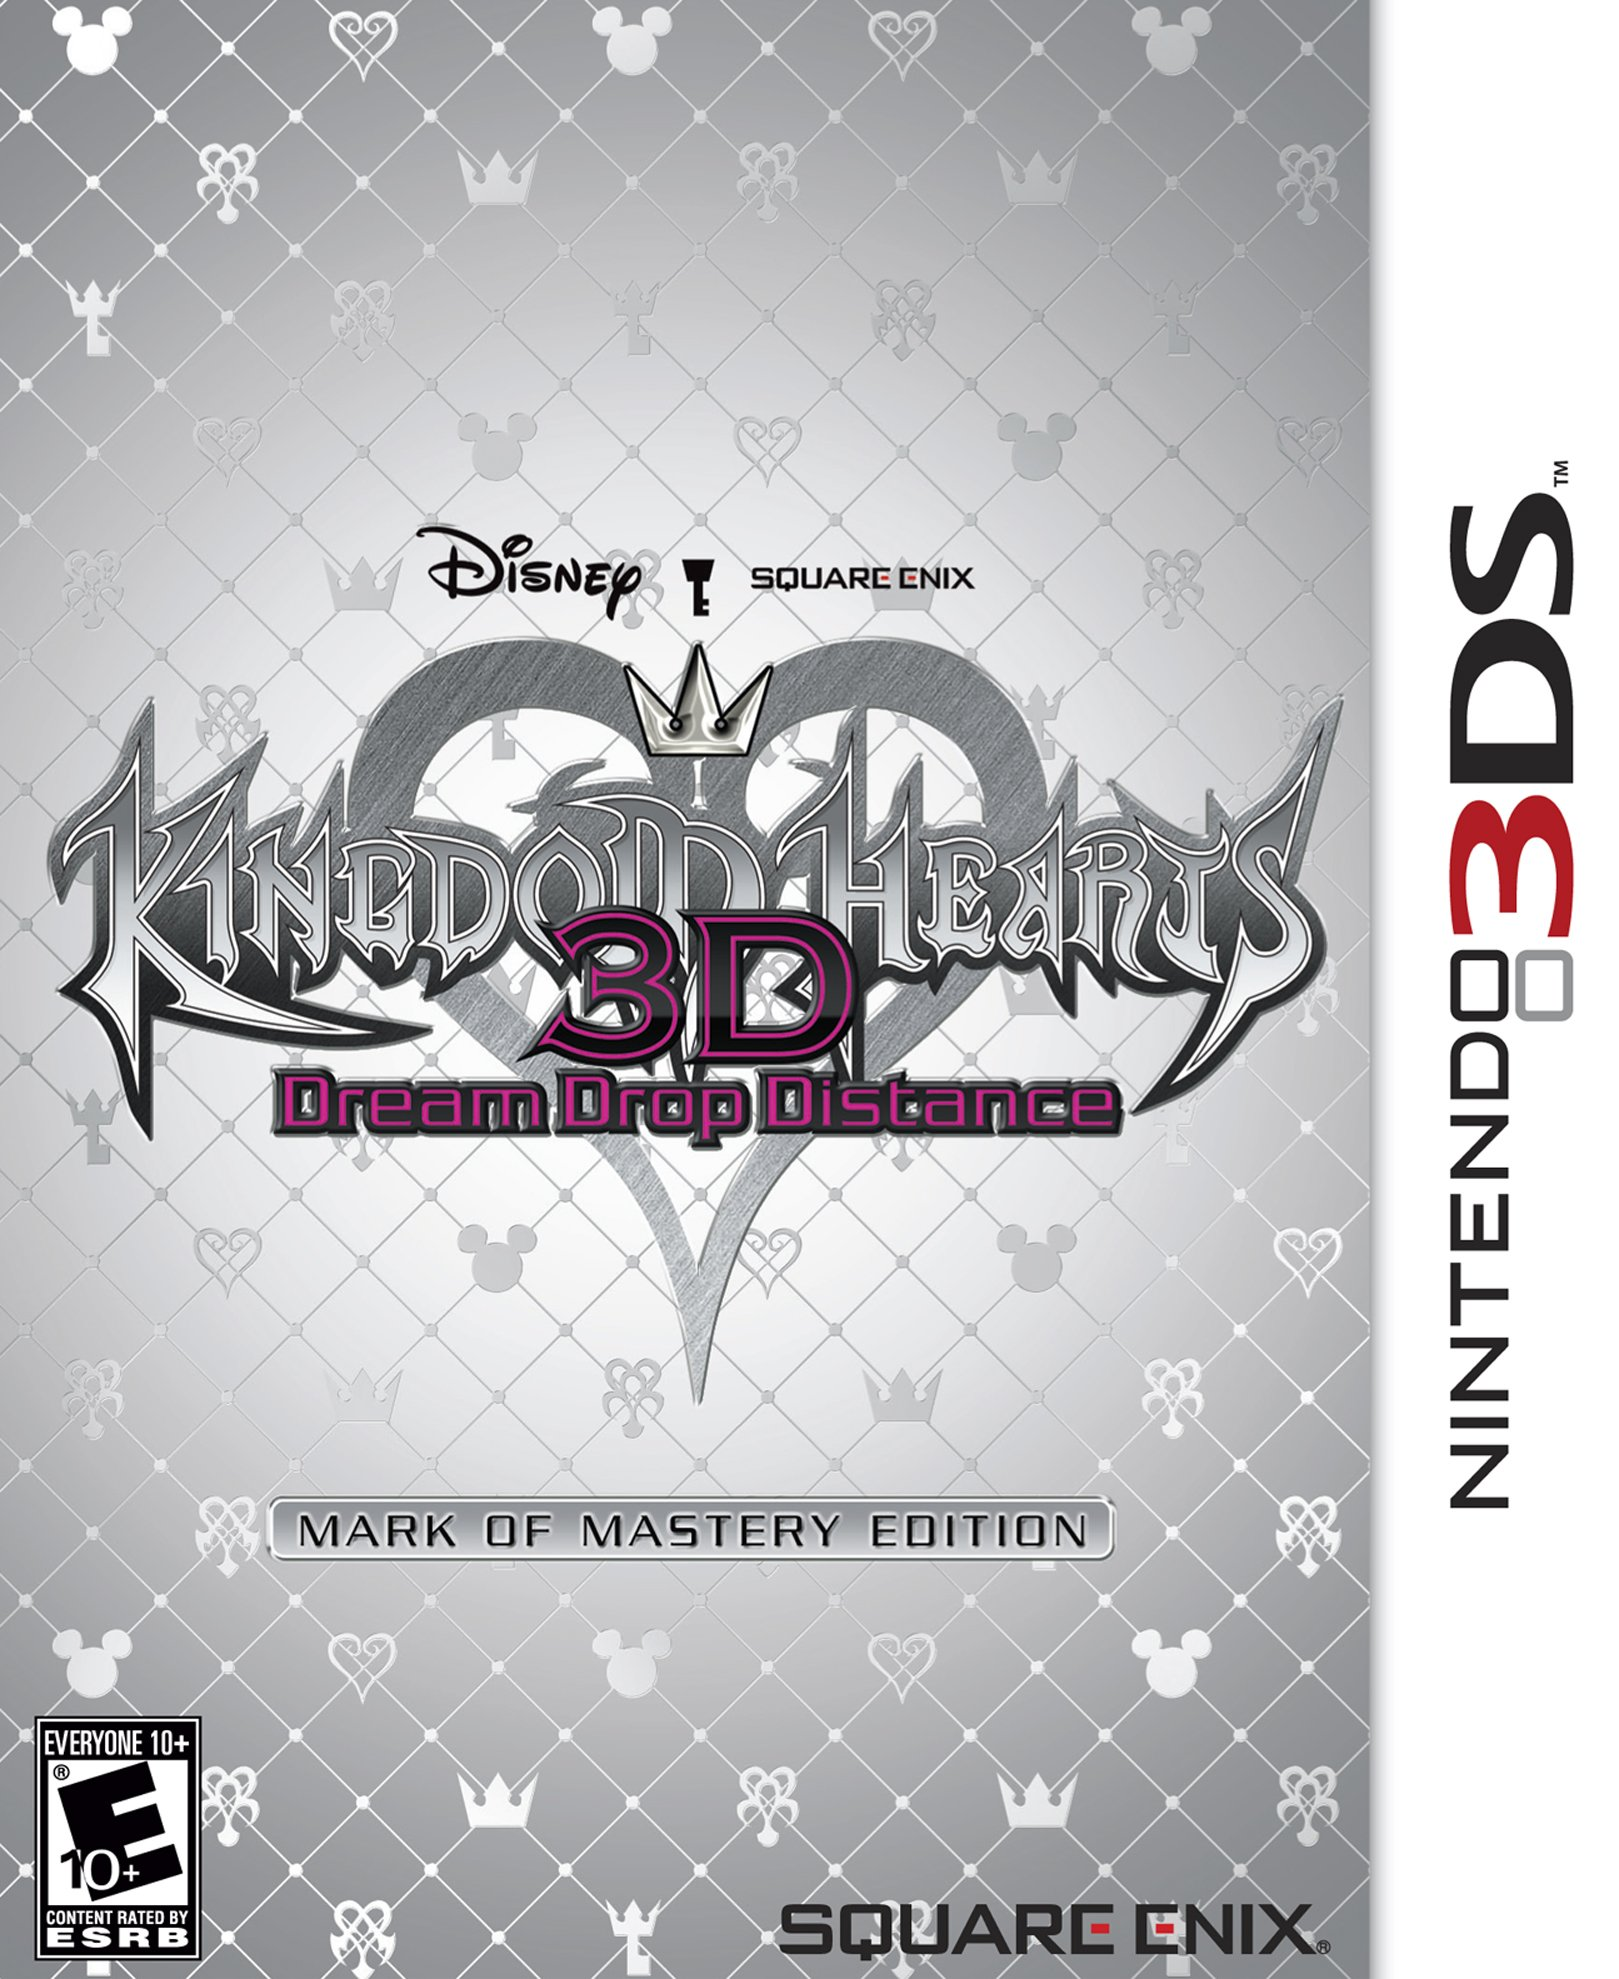 Kingdom Hearts 3D Dream Drop Distance - Collector's Edition - Nintendo 3DS